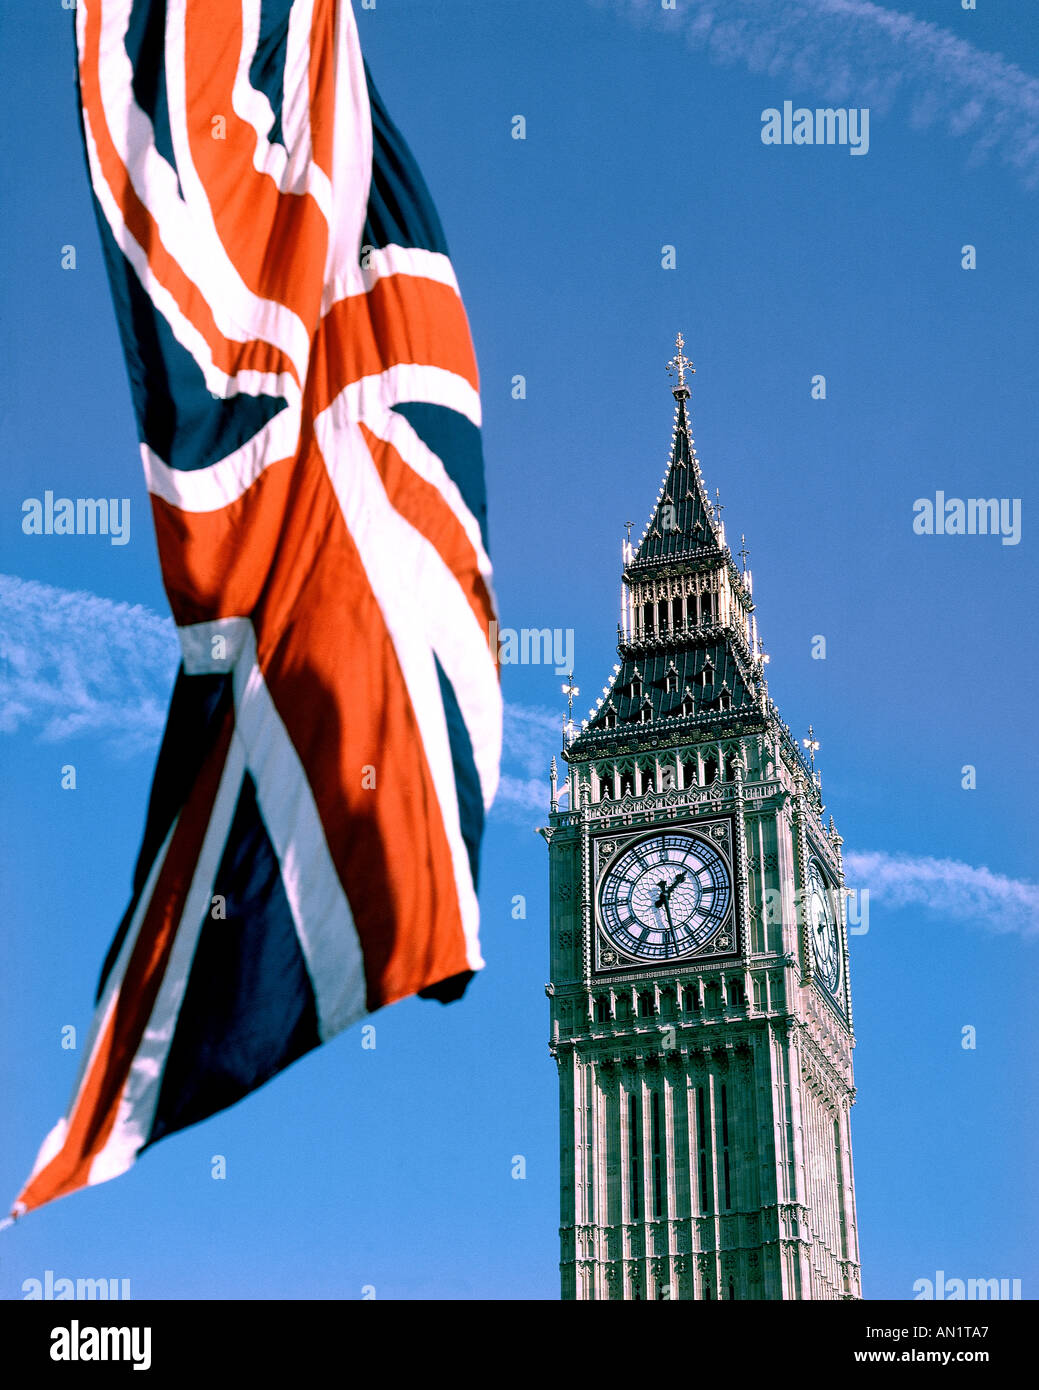 GB - LONDON: Big Ben (Elizabeth Tower) and Union Jack - Stock Image